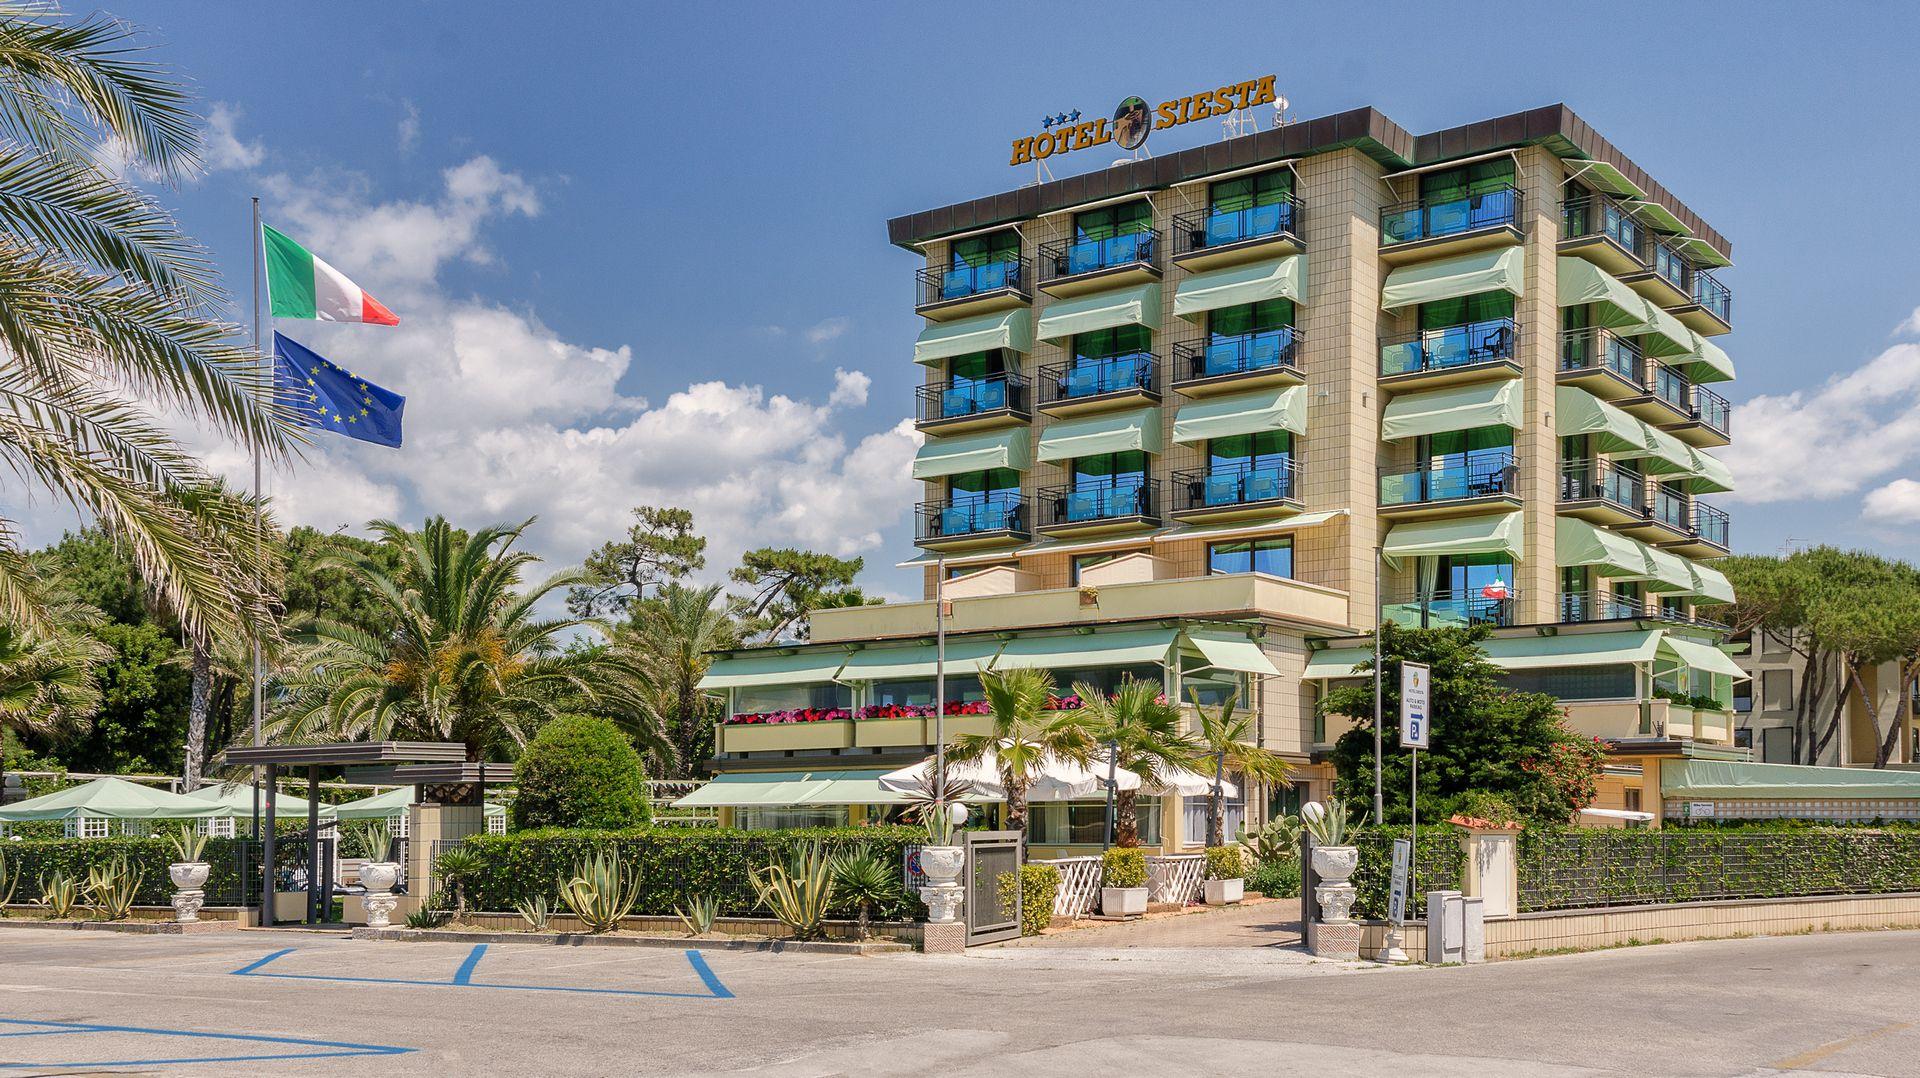 Hotel Siesta a Lido di Camaiore albergo Versilia 3 stelle bed ...